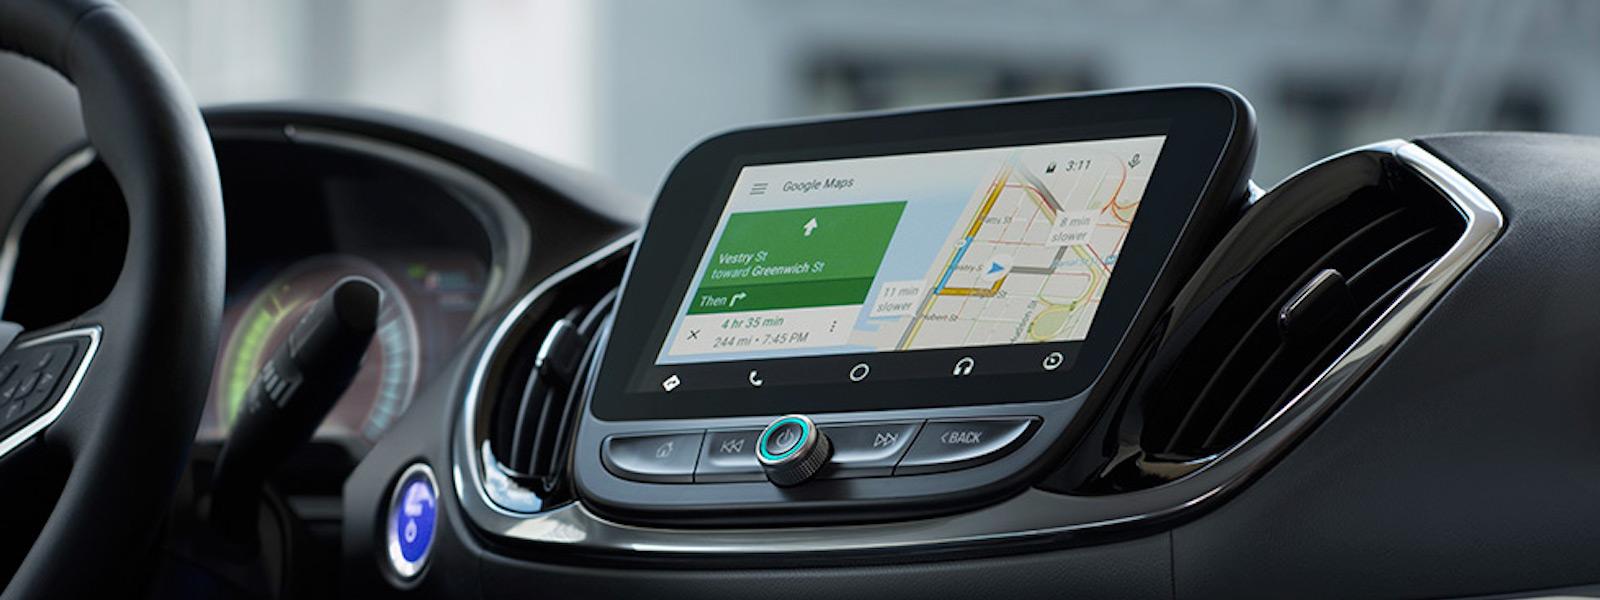 2017 Chevy Volt Technology